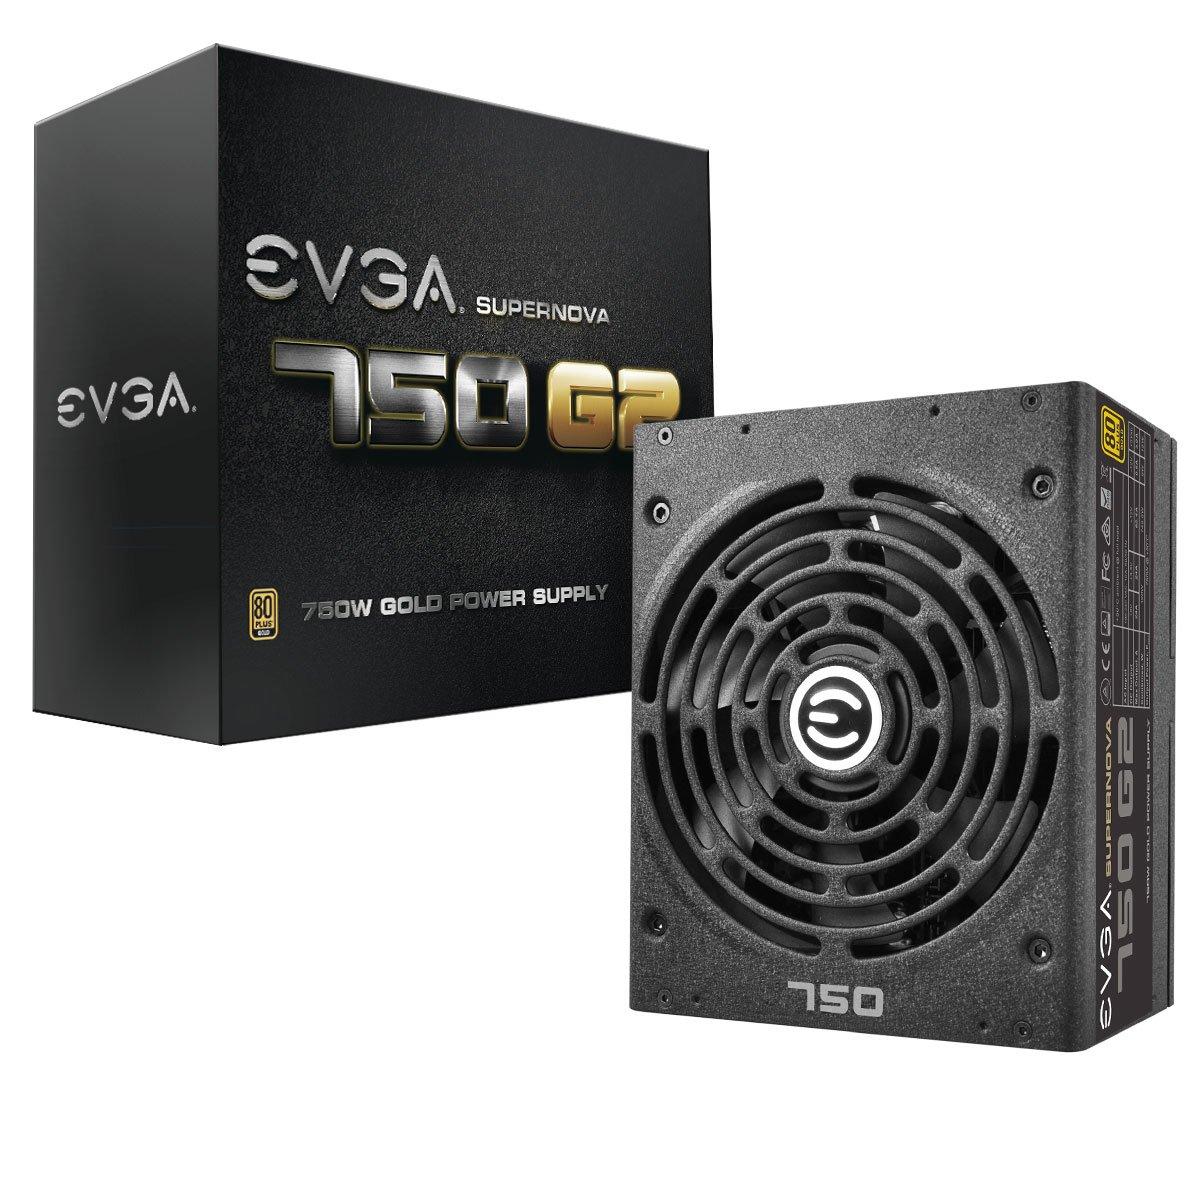 EVGA SuperNOVA 750 G2 80+ GOLD